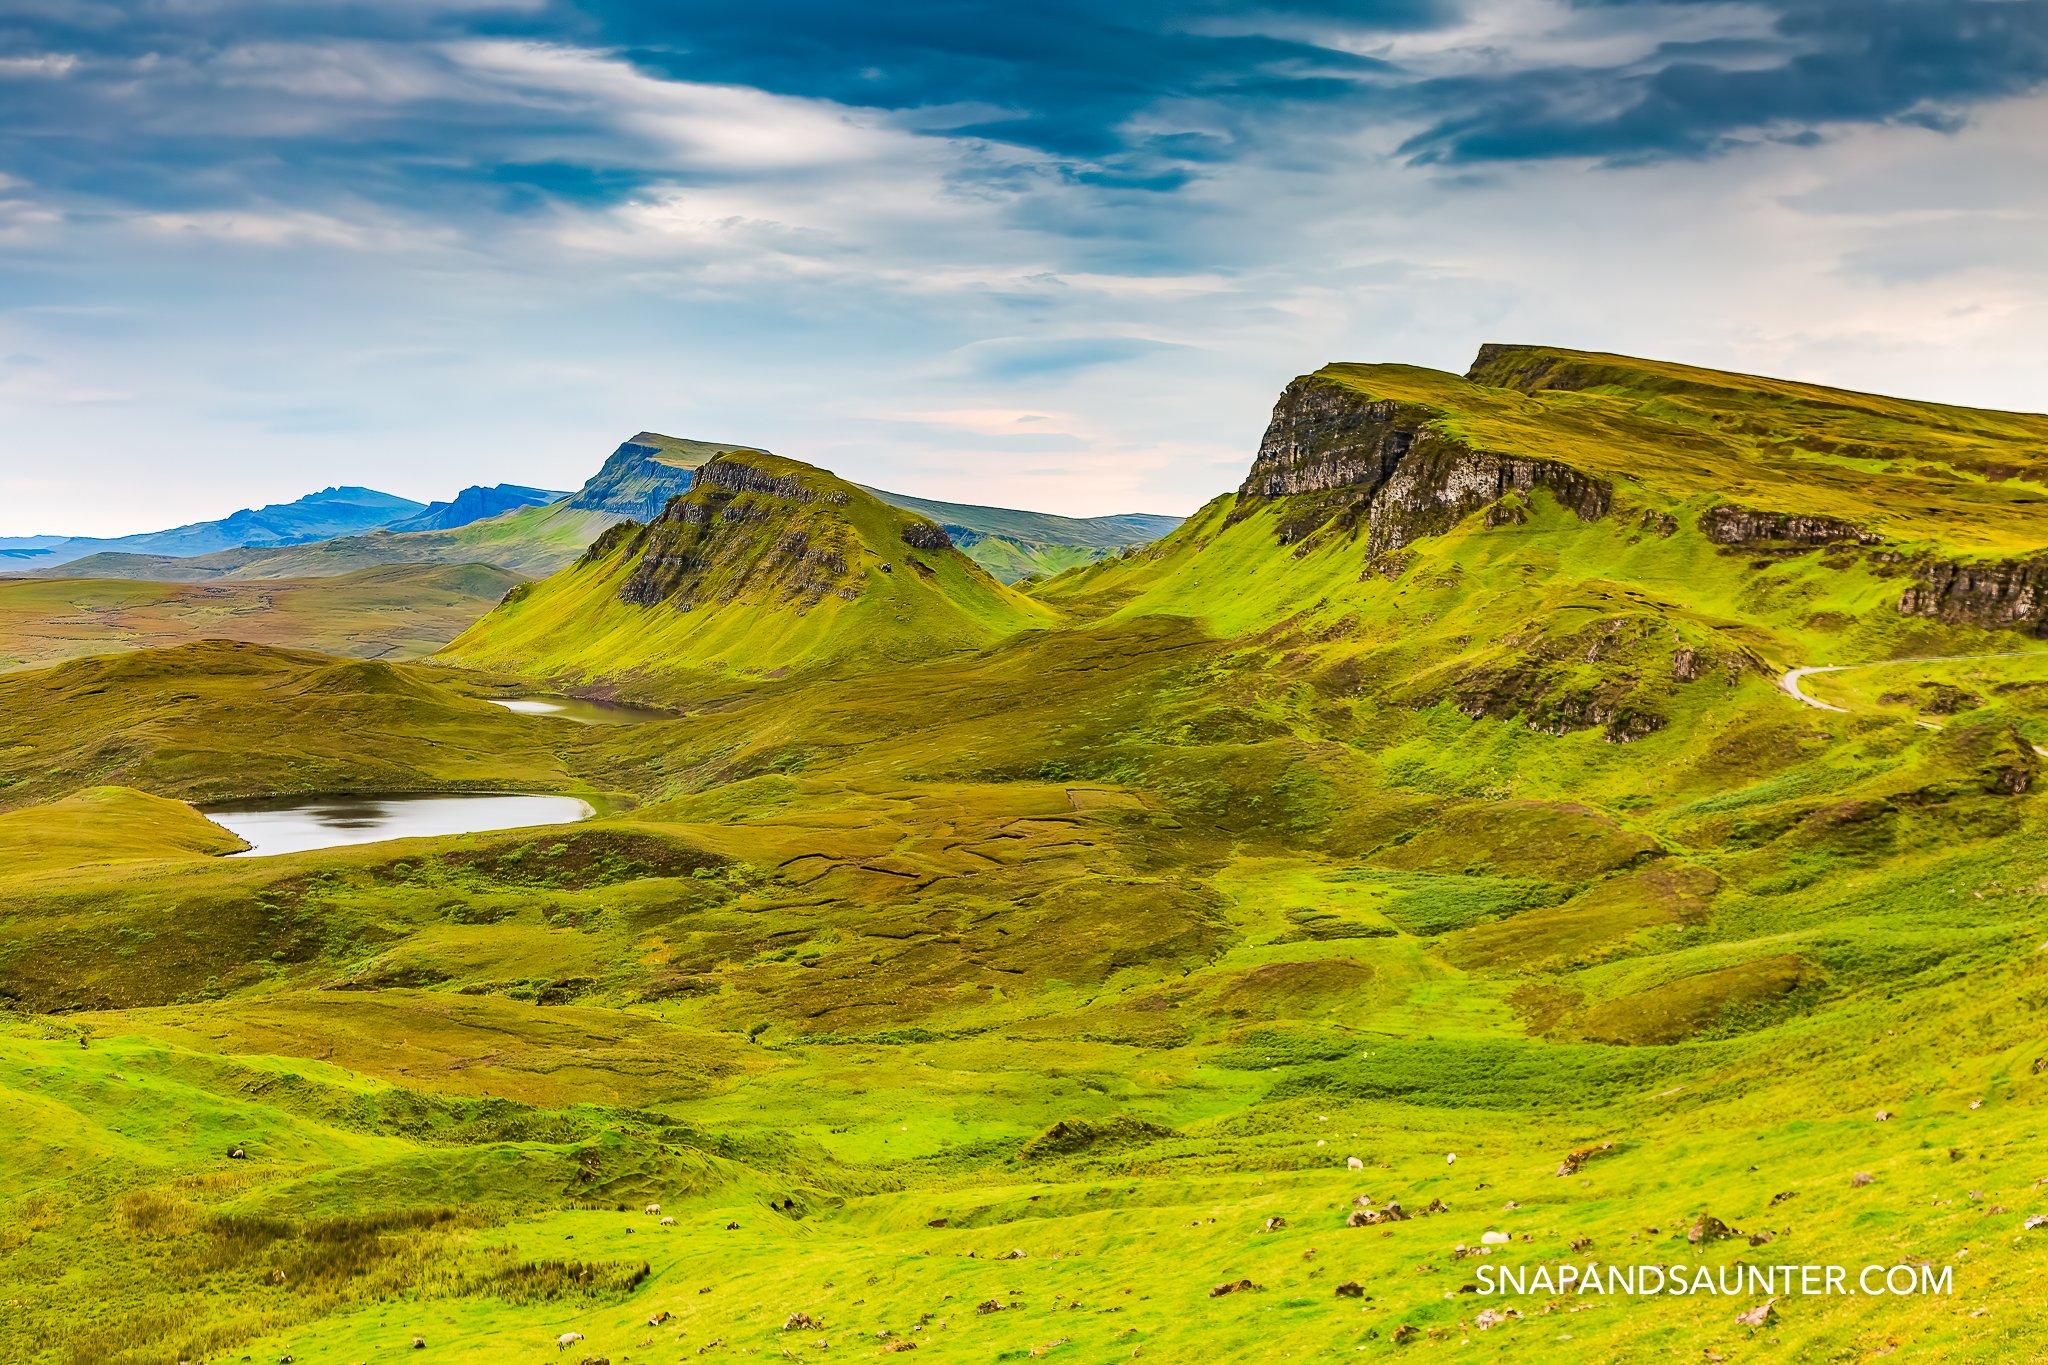 Quiraing on the Isle of Skye in Scotland